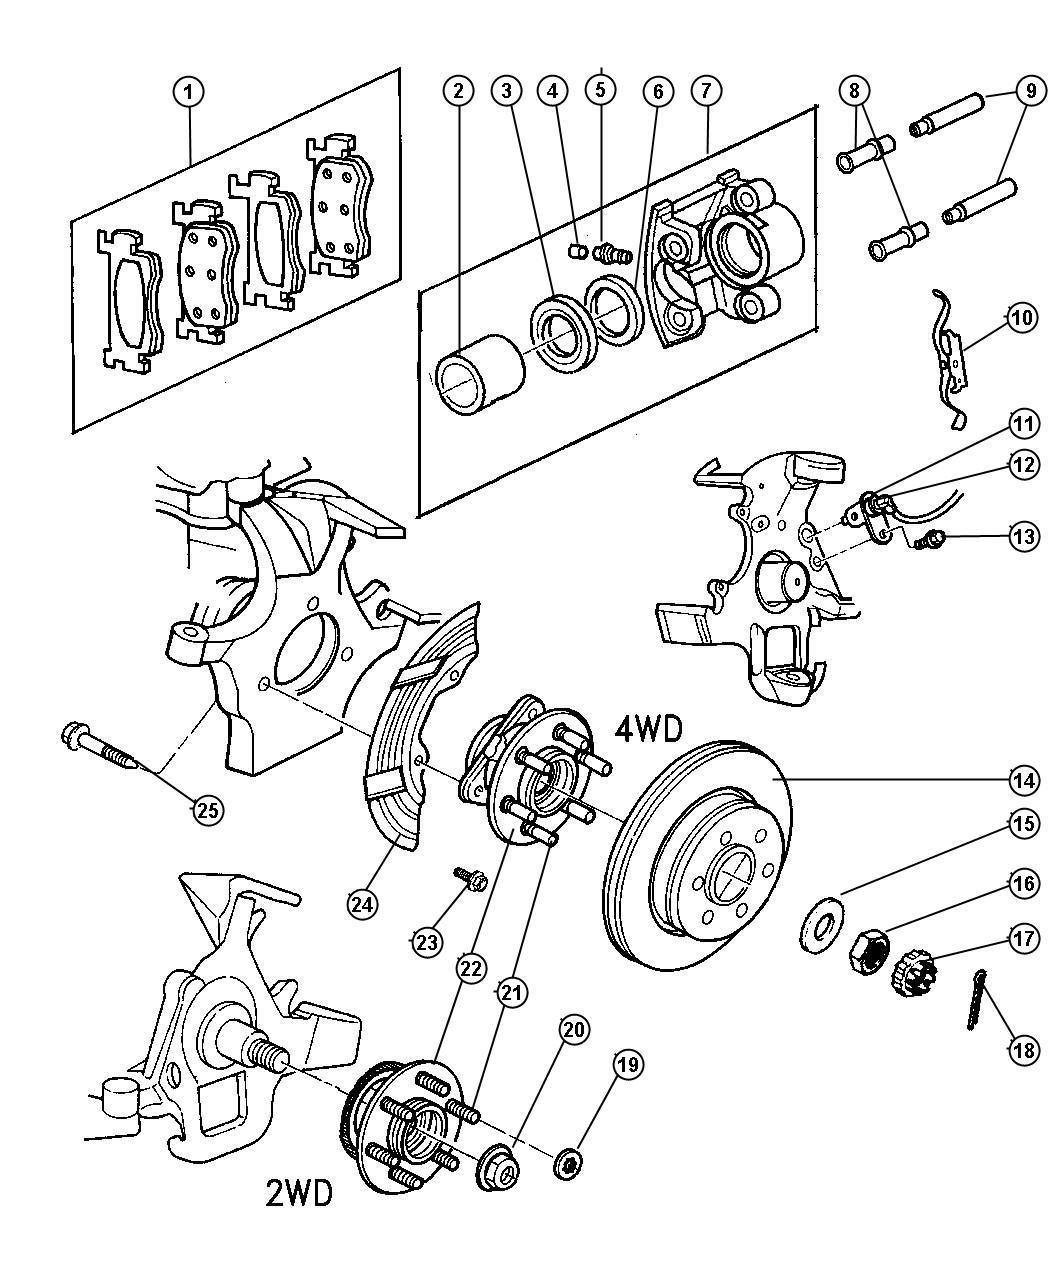 1999 Dodge Dakota Bolt  Hub  Mounting  Hub And Bearing To Knuckle  Knuckle To Hub  Knuckle